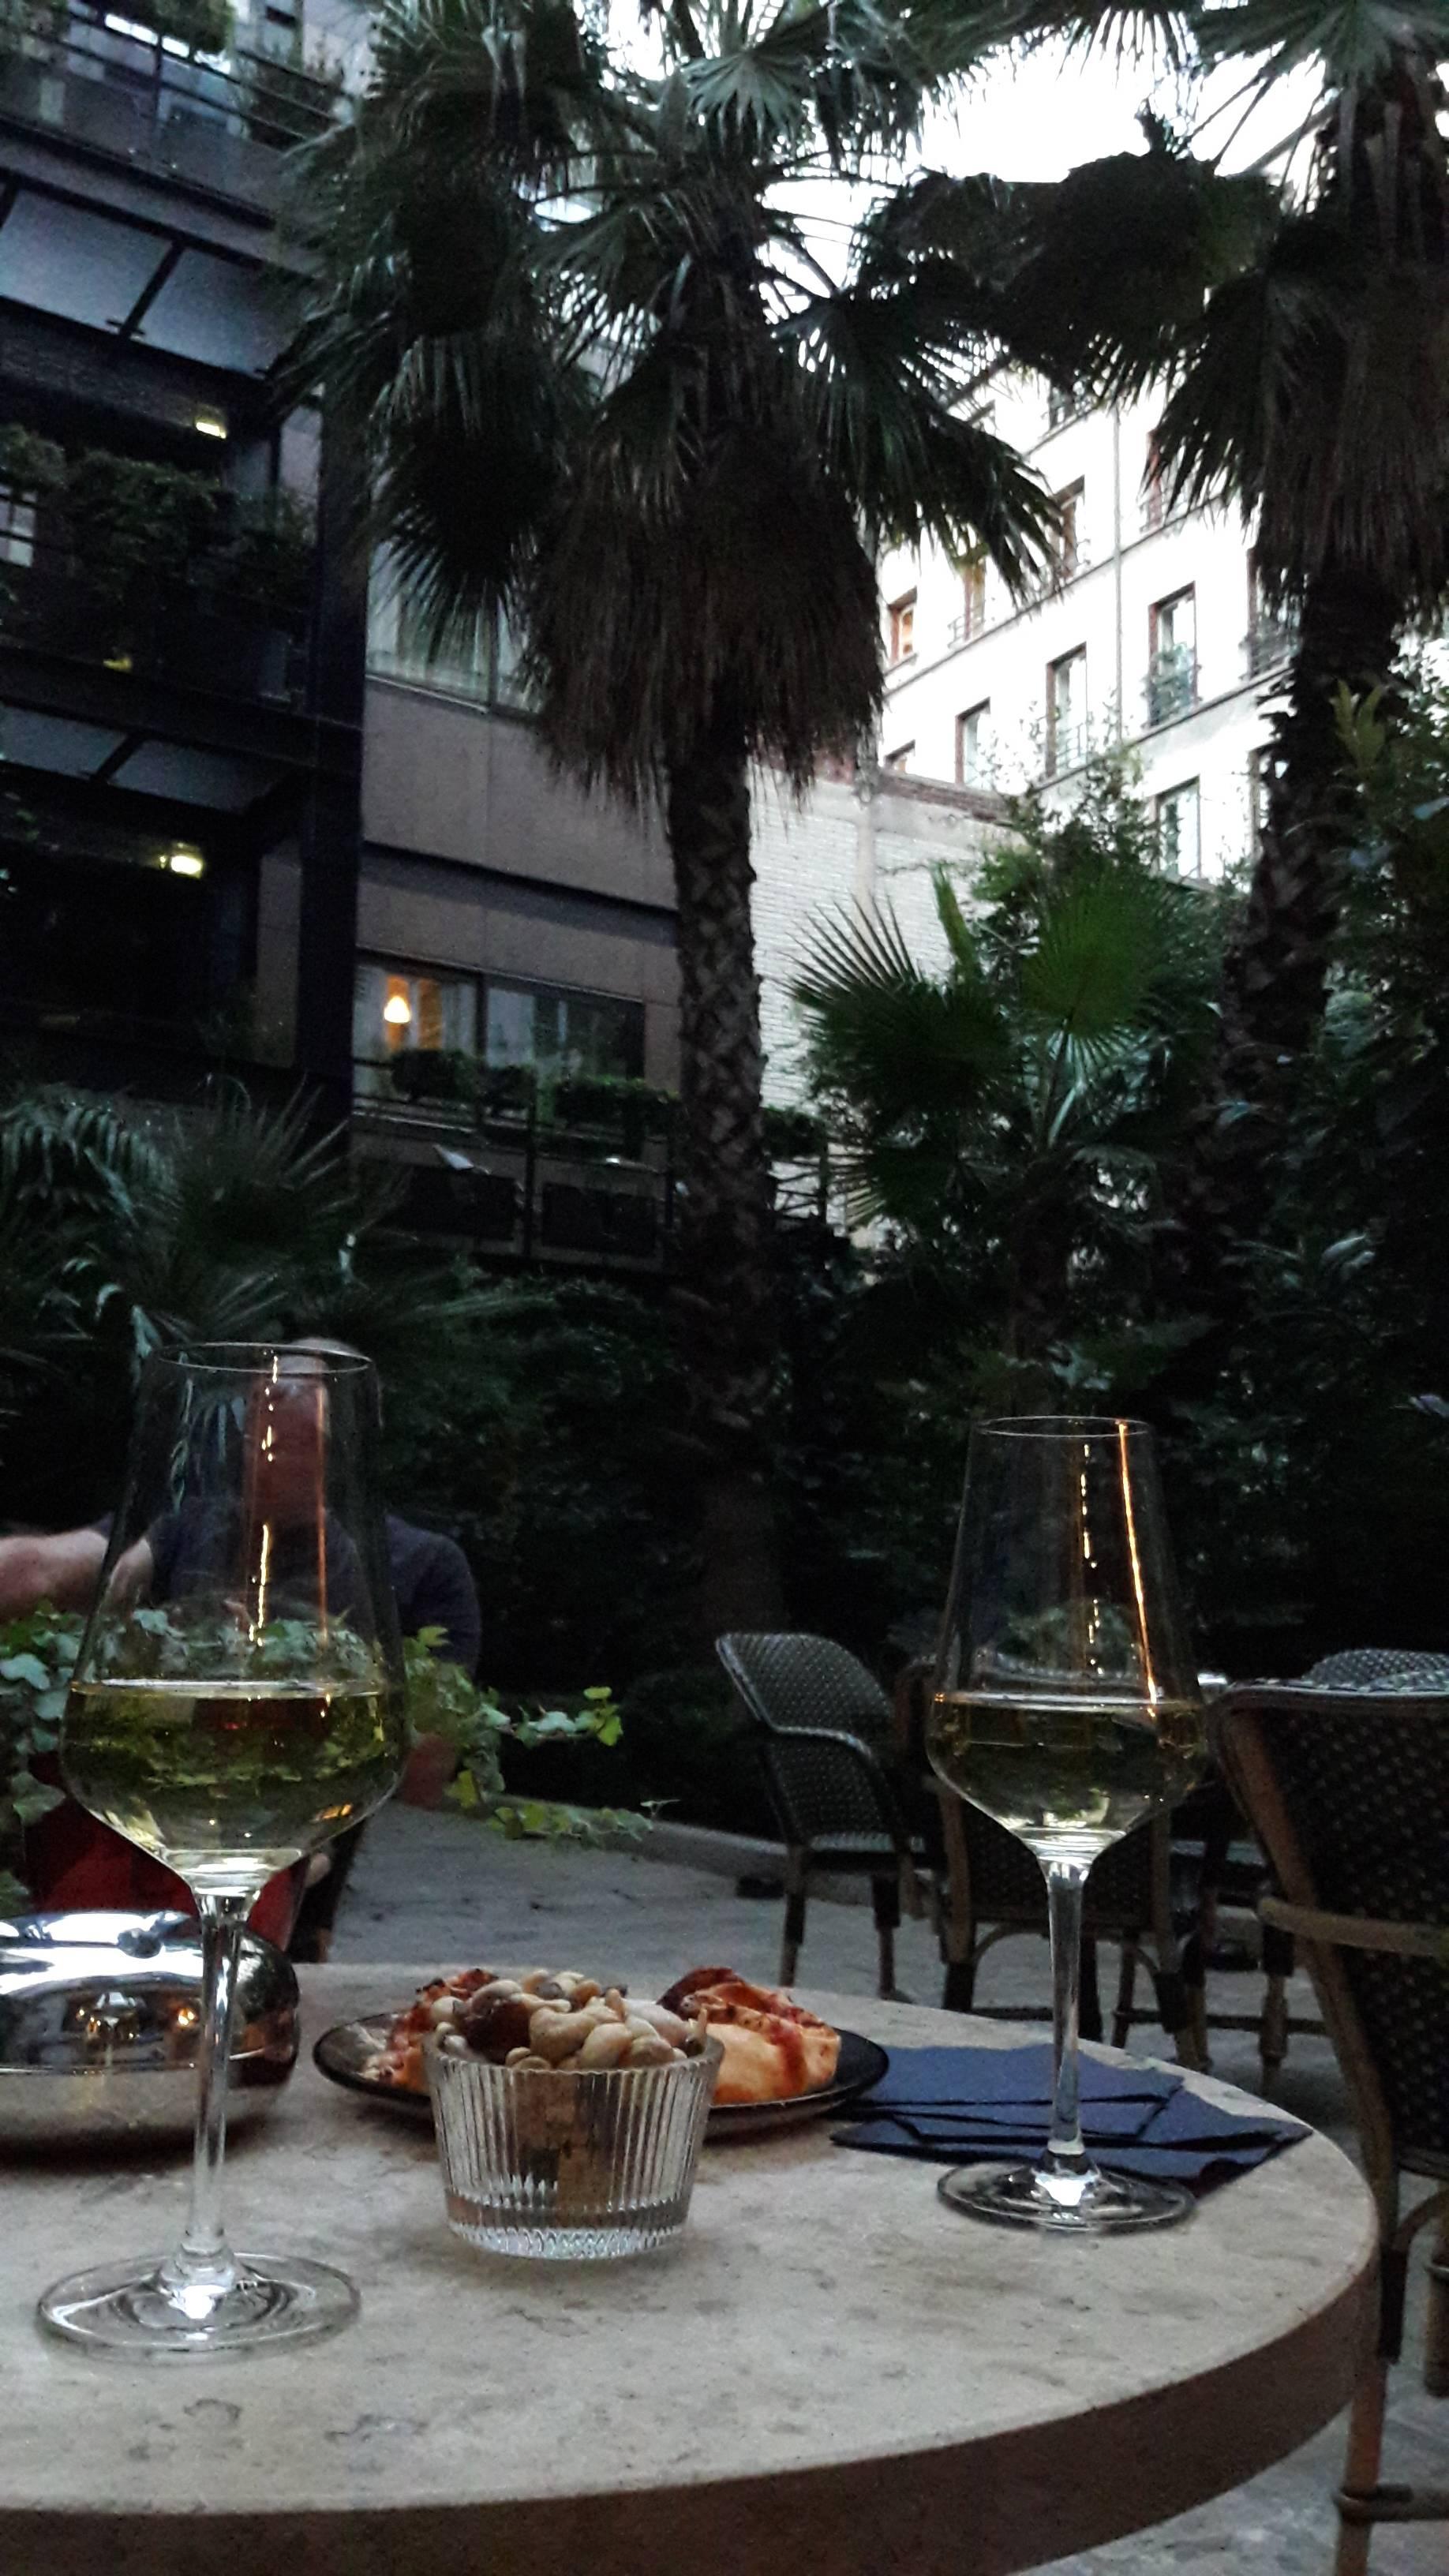 Photo 2: Hôtel Beauséjour pour sa terrasse secrète